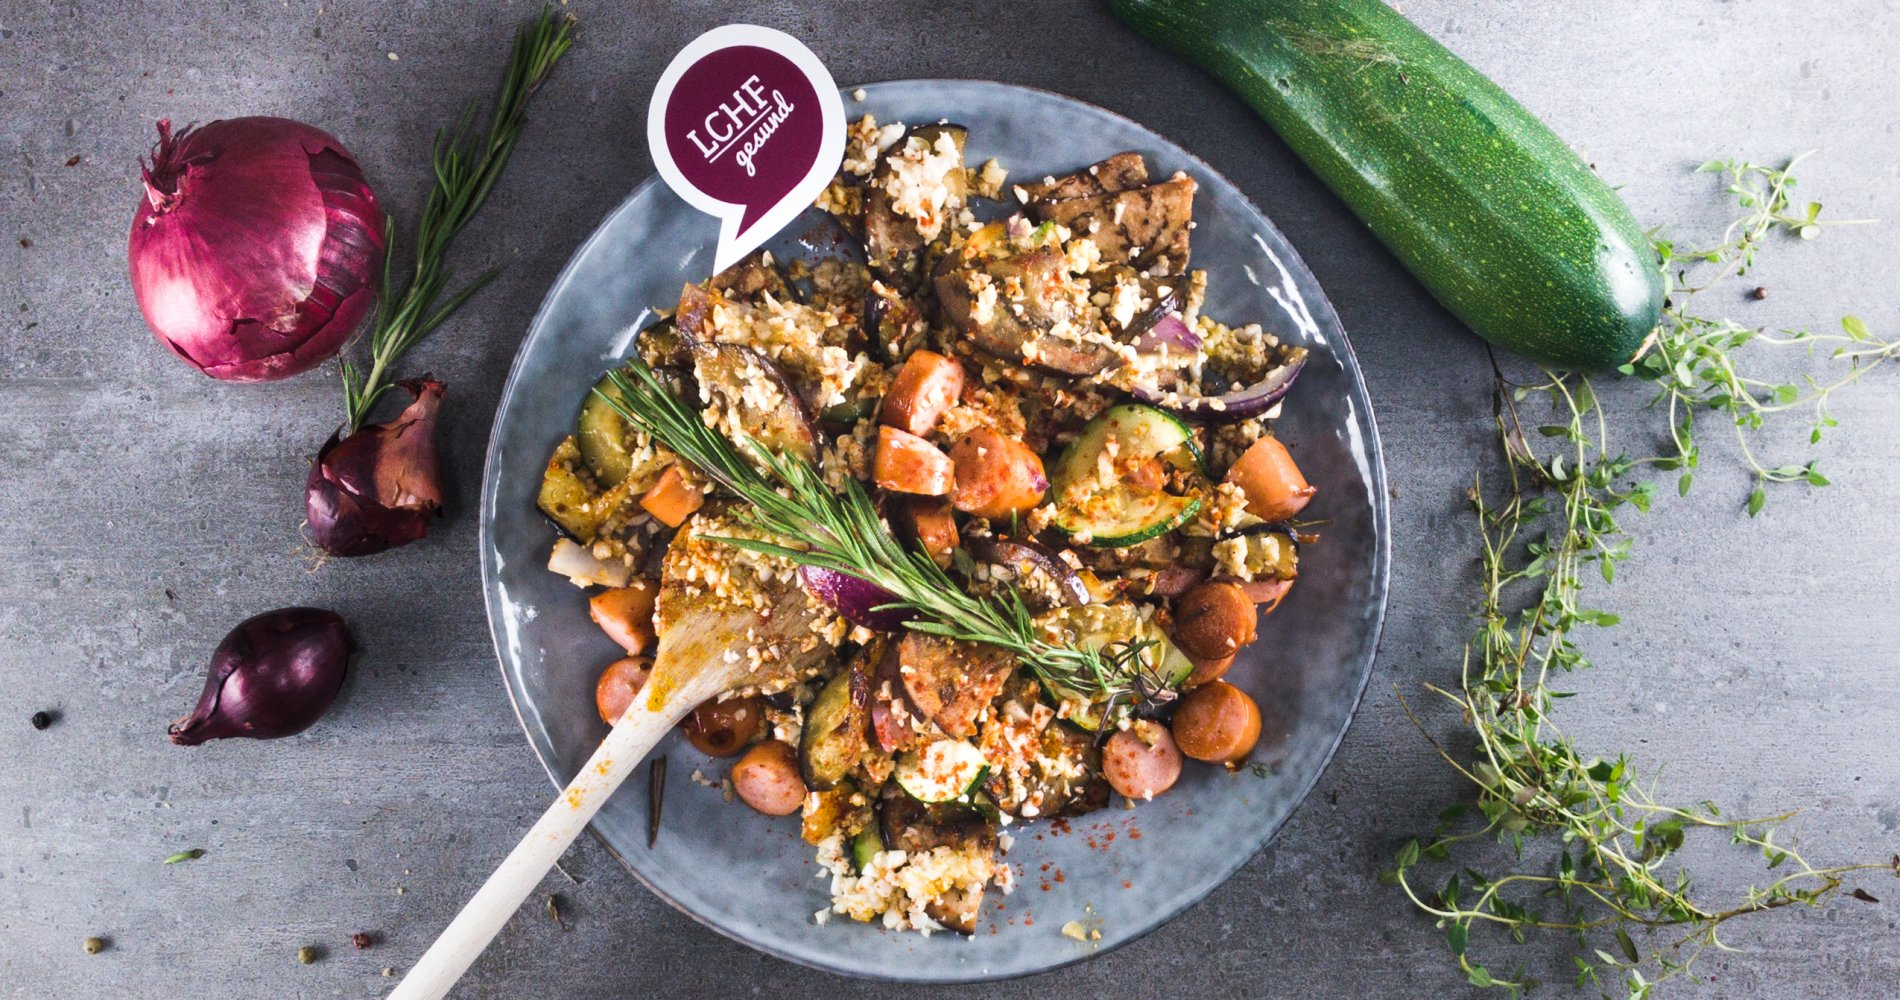 Rezept Low Carb: Gemüse-Wienerle-Pfanne - LCHF-gesund.de